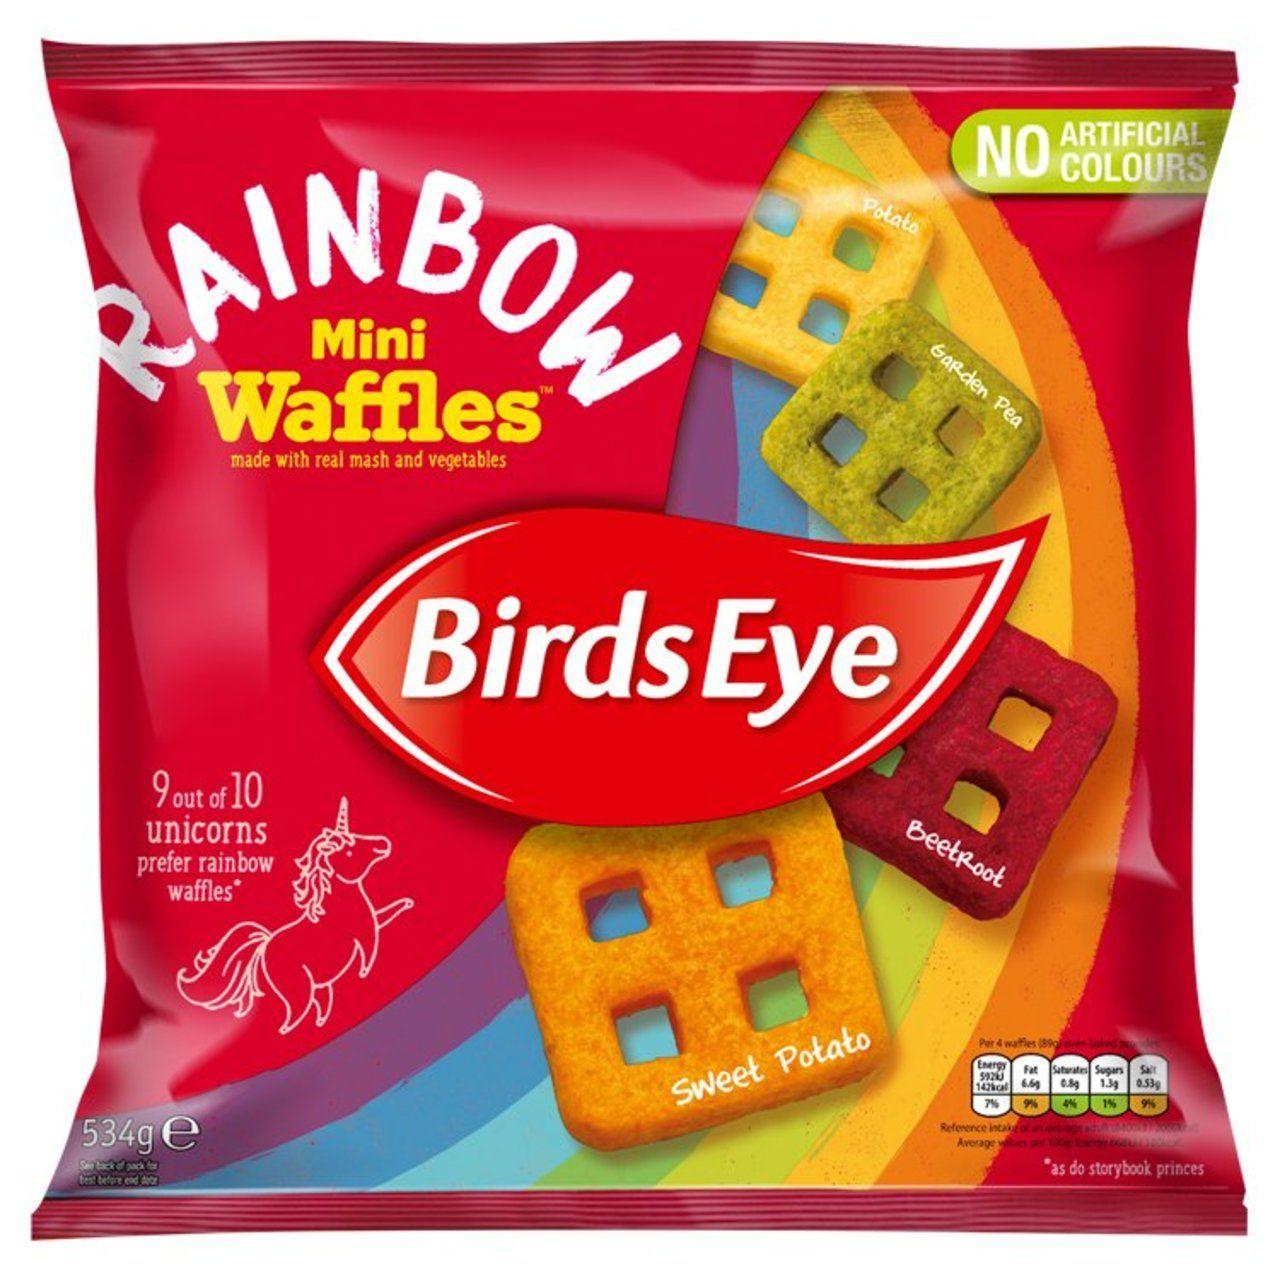 Birds Eye Rainbow Waffles - 49p in Farmfoods (Shrewsbury)